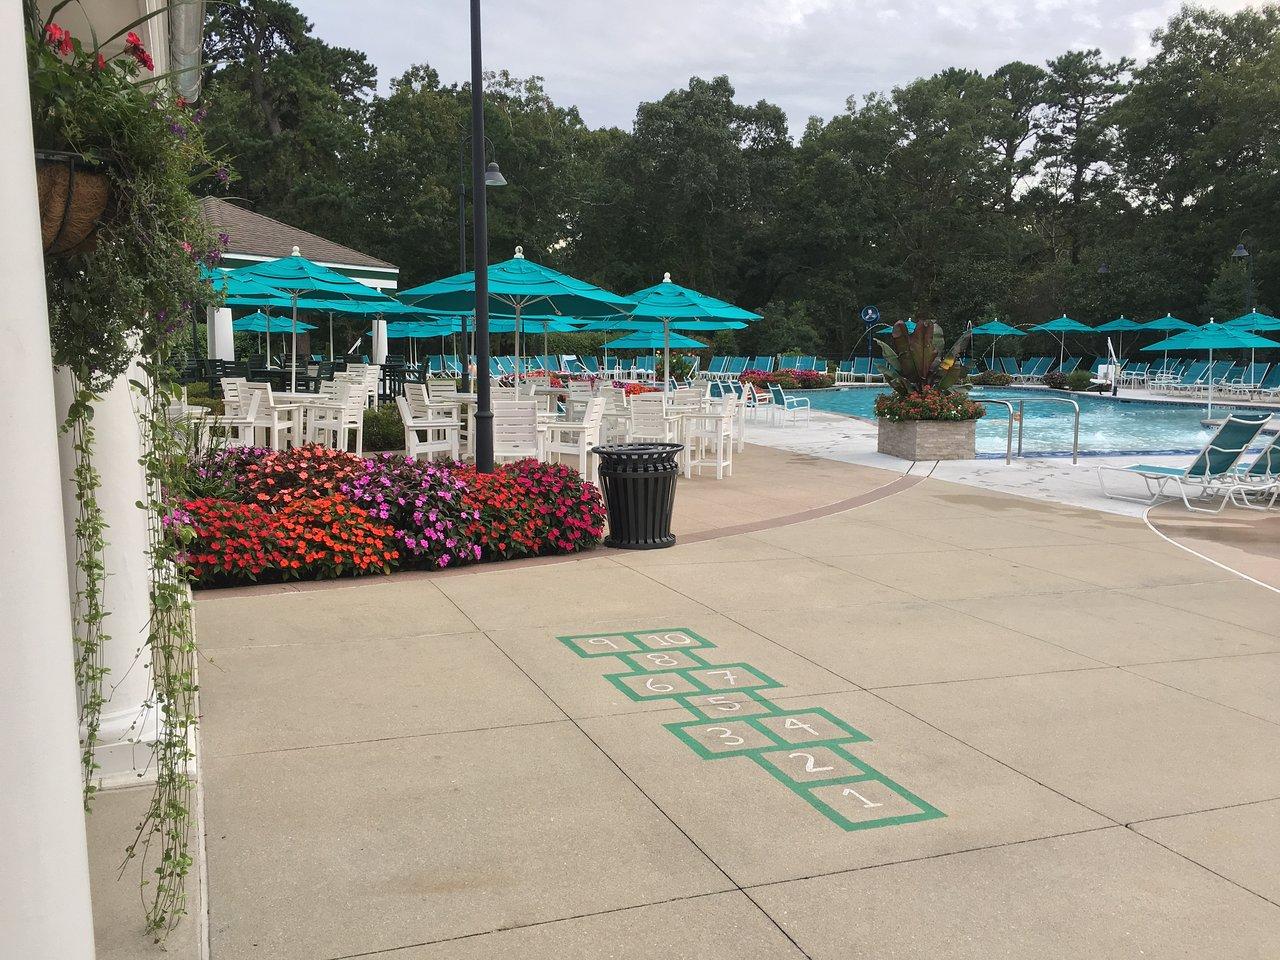 Marriott's Fairway Villas Pool Place